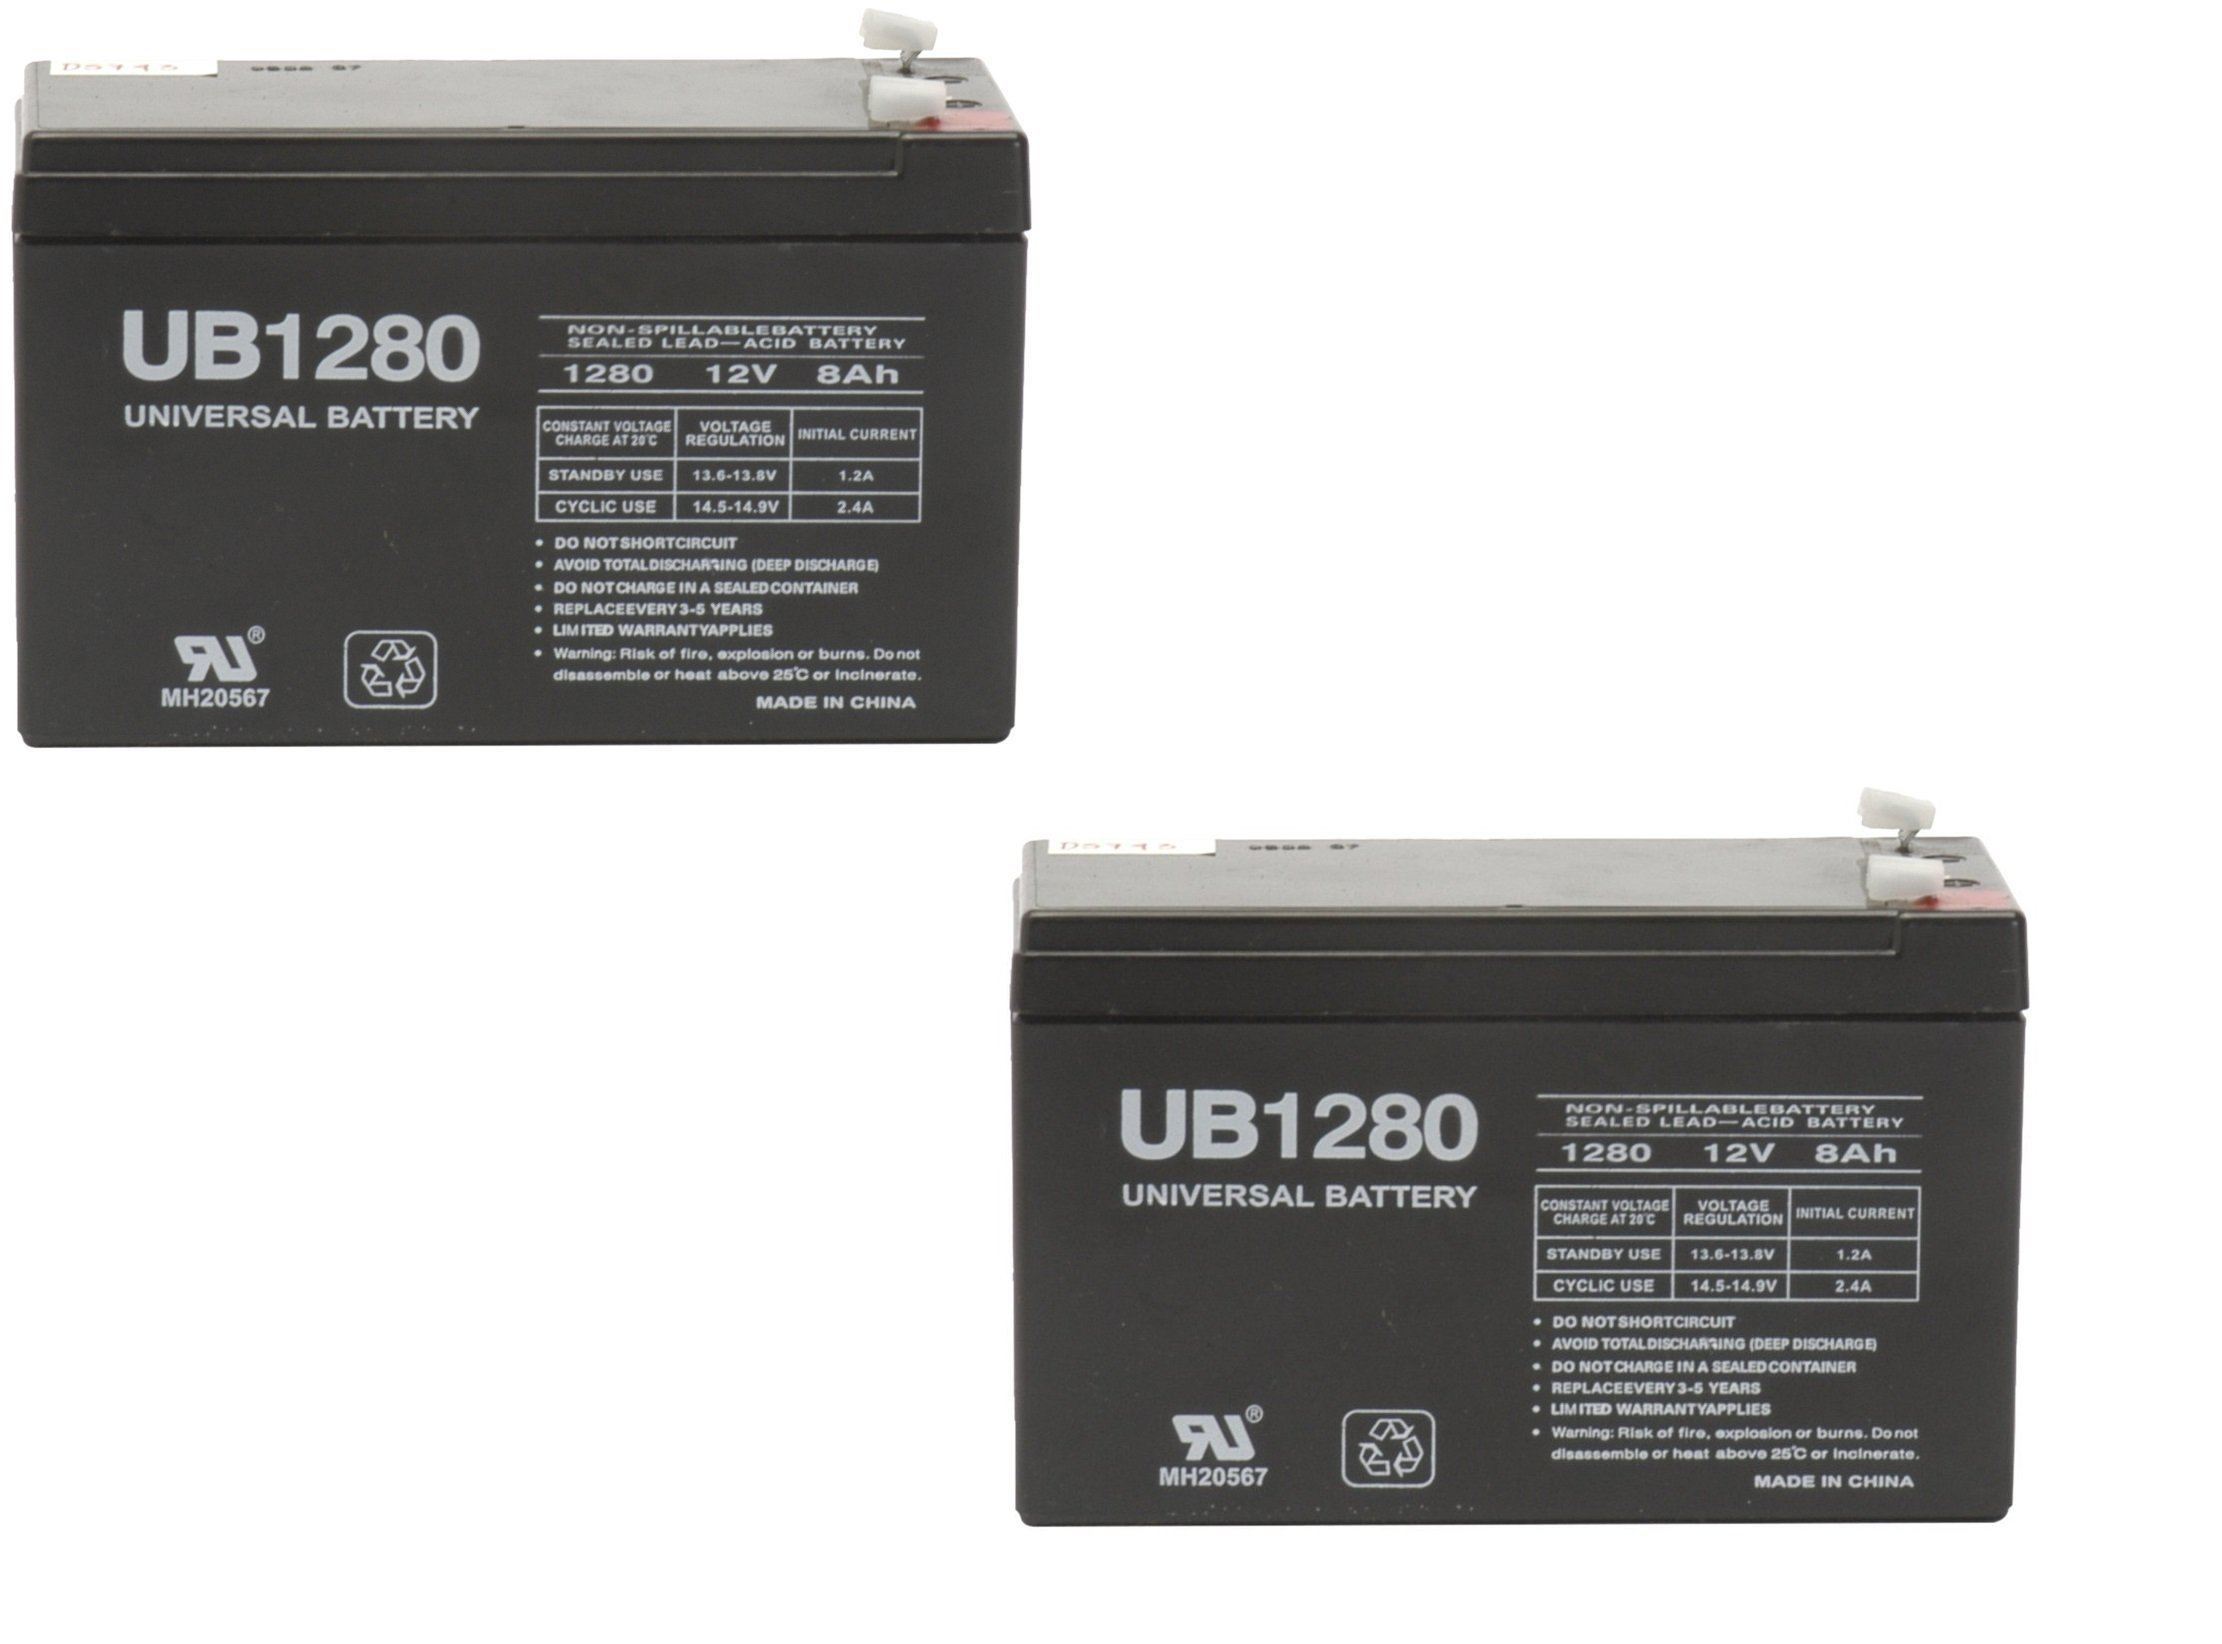 12V 8AH Battery UB1280 D5779 RB128 PS1272 APC 400 420 Alarm Security System - 2 Pack